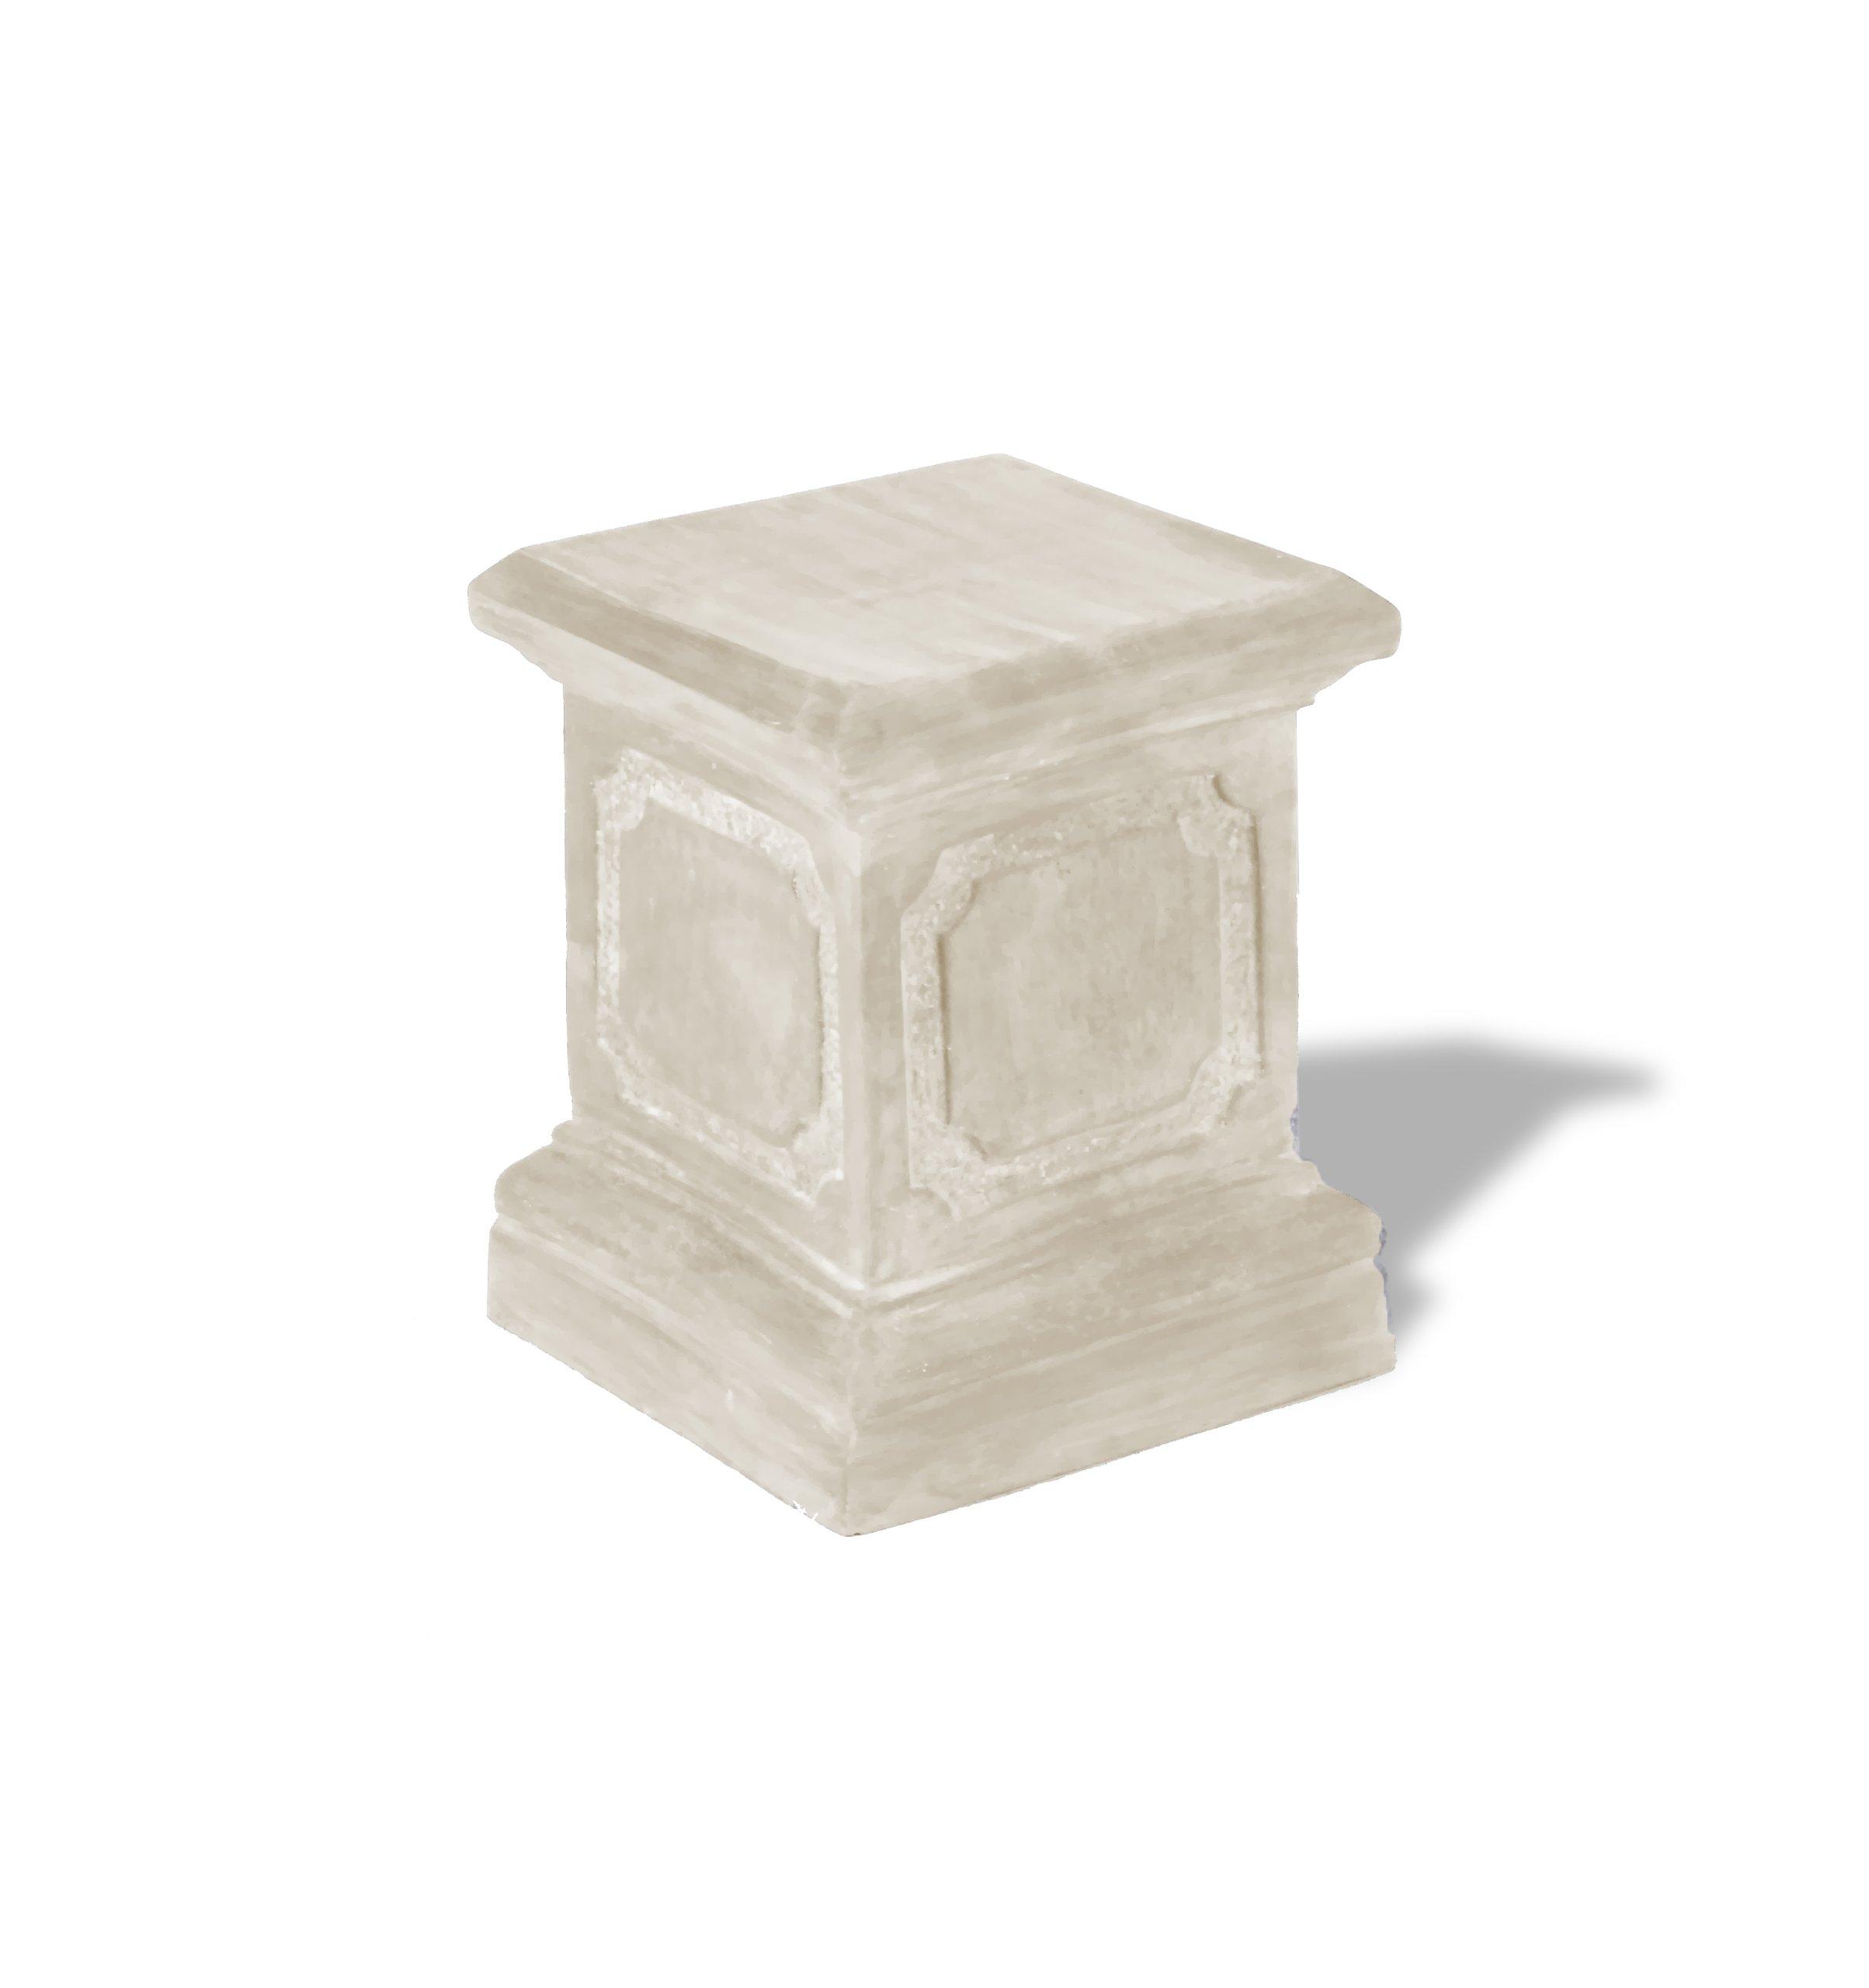 Amedeo Design ResinStone 1900-1L Paneled Pedestal, 15 by 15 by 20-Inch, Limestone